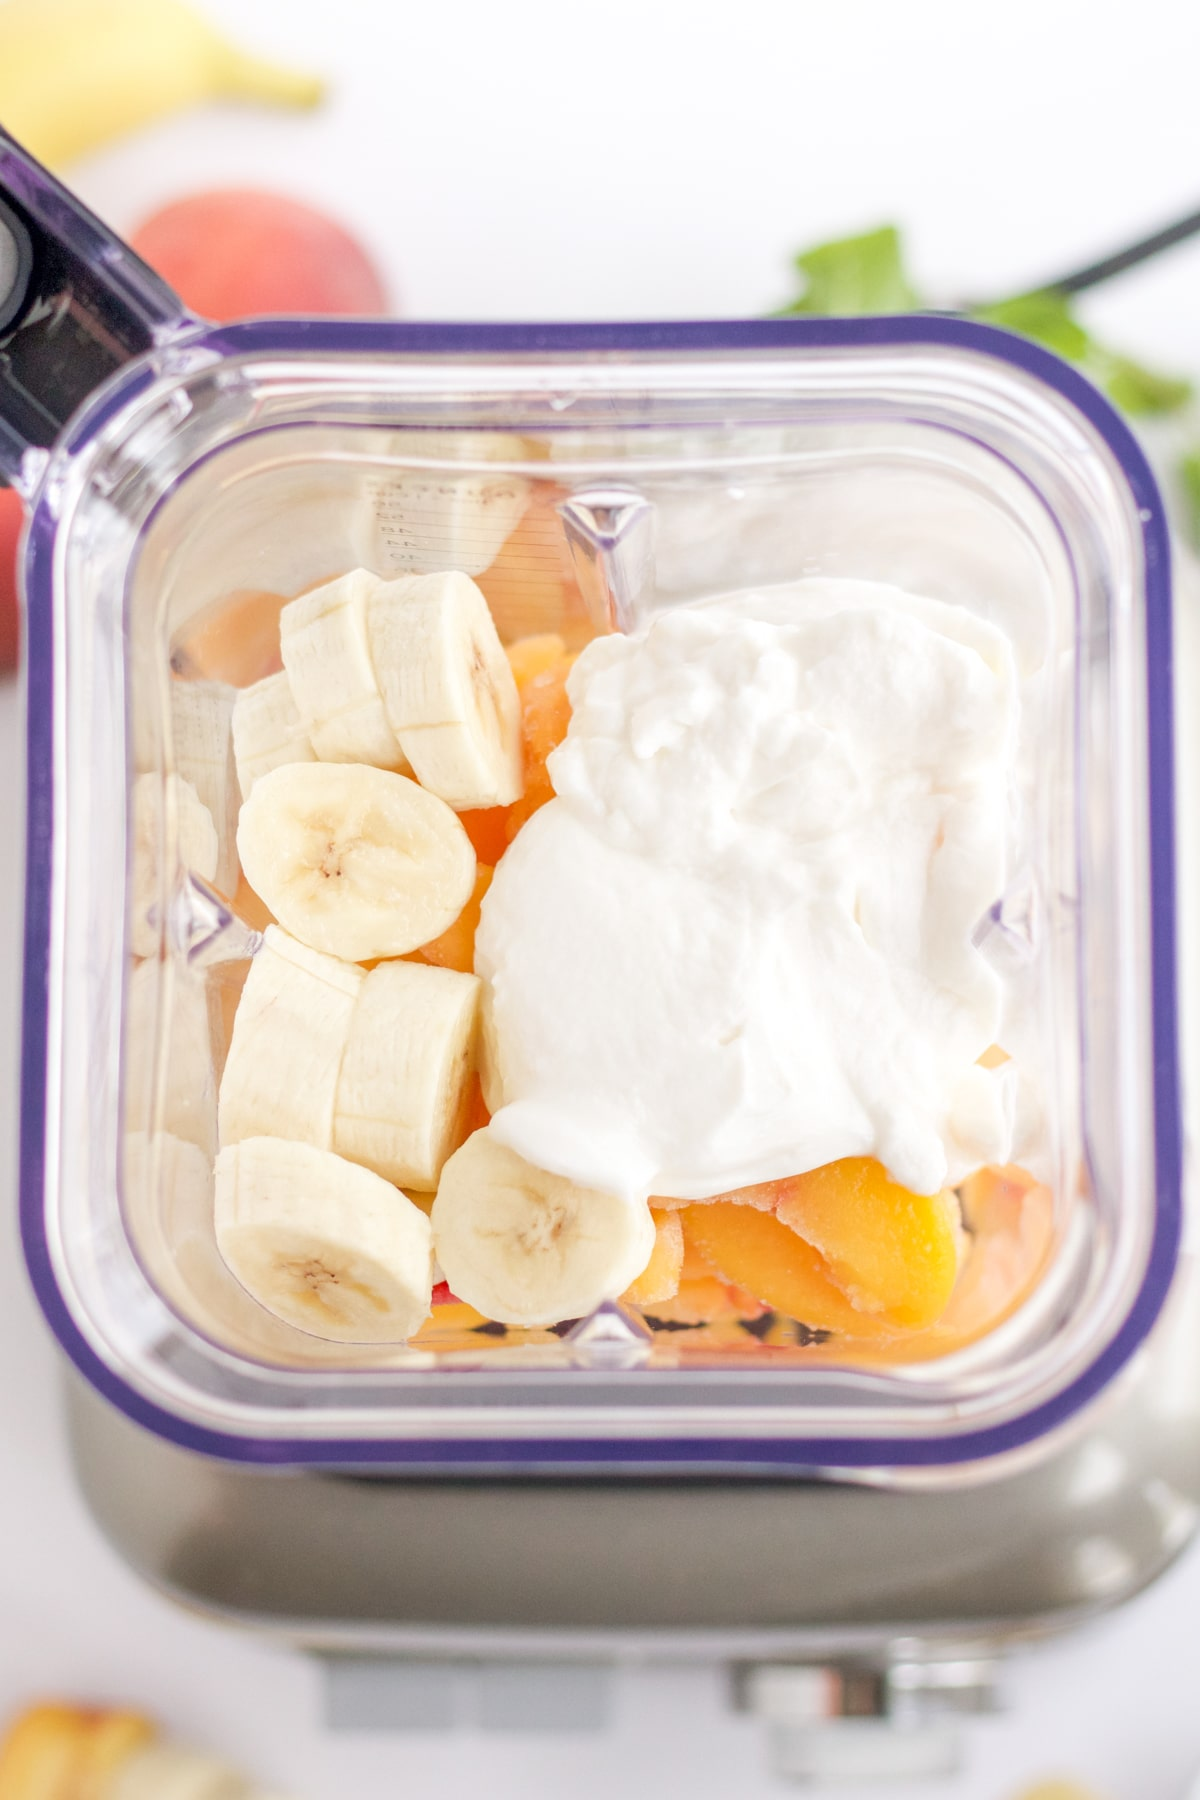 overhead shot of ingredients in a blender: bananas, yogurt and peaches